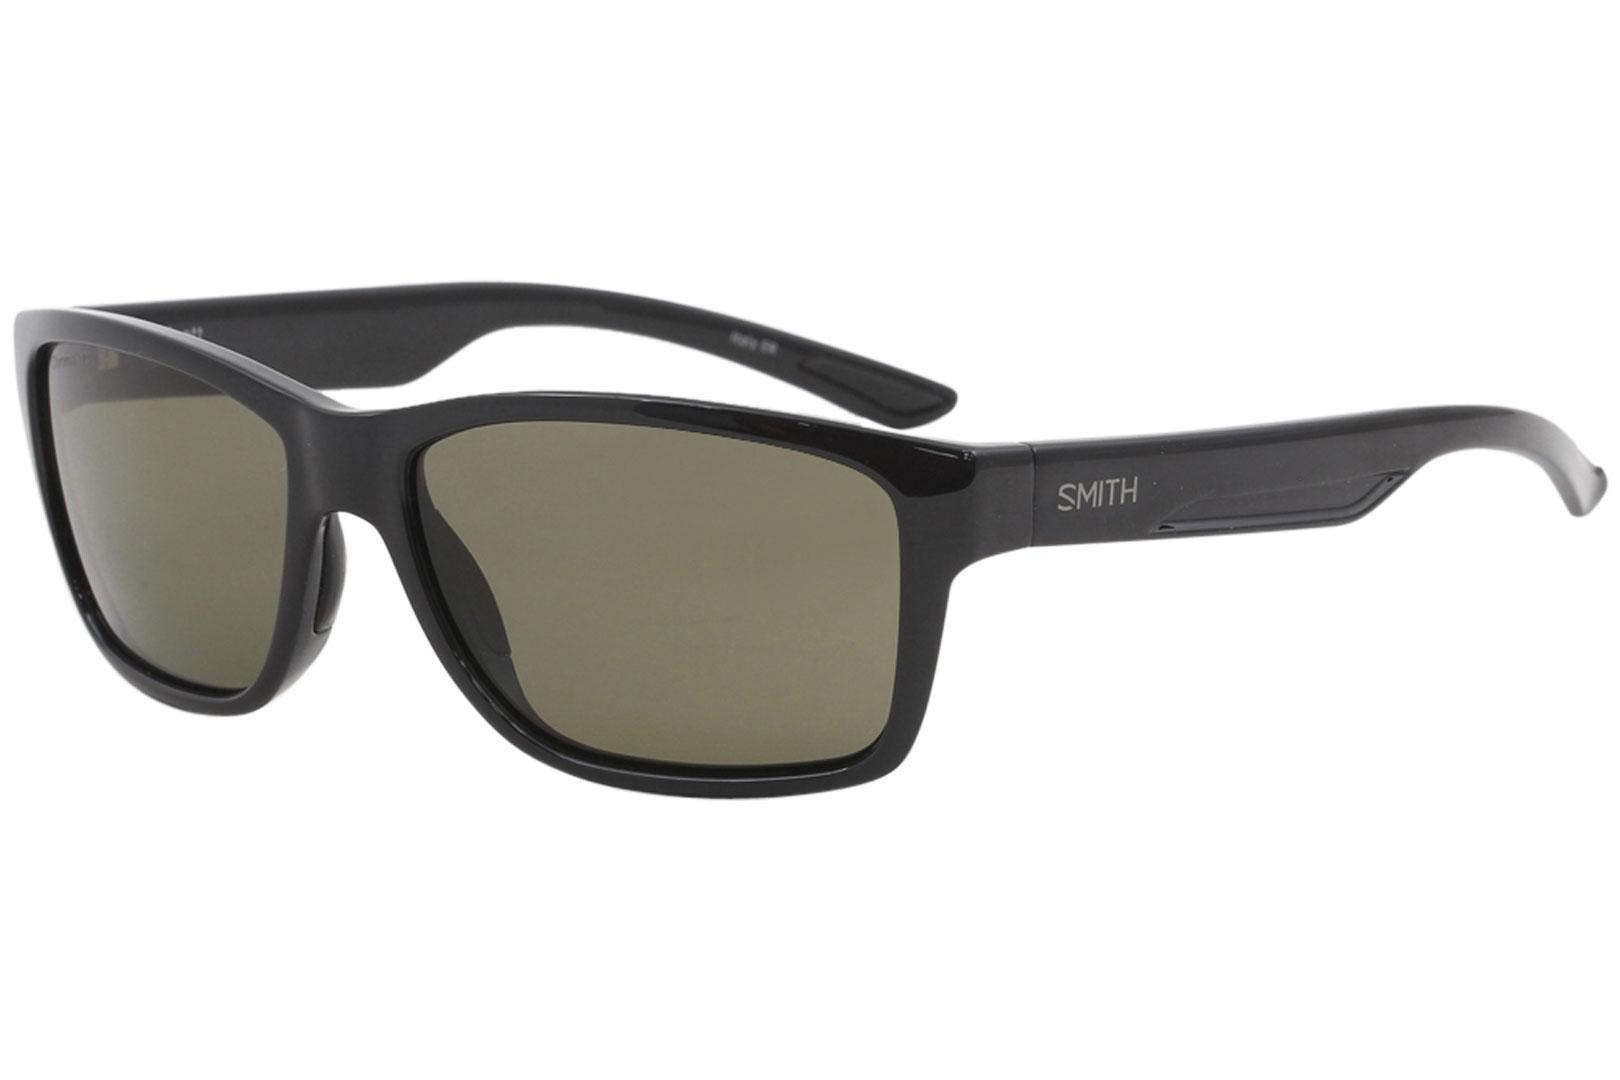 dd06b29b83b Smith Optics Wolcott Fashion Rectangle Polarized Sunglasses by Smith Optics